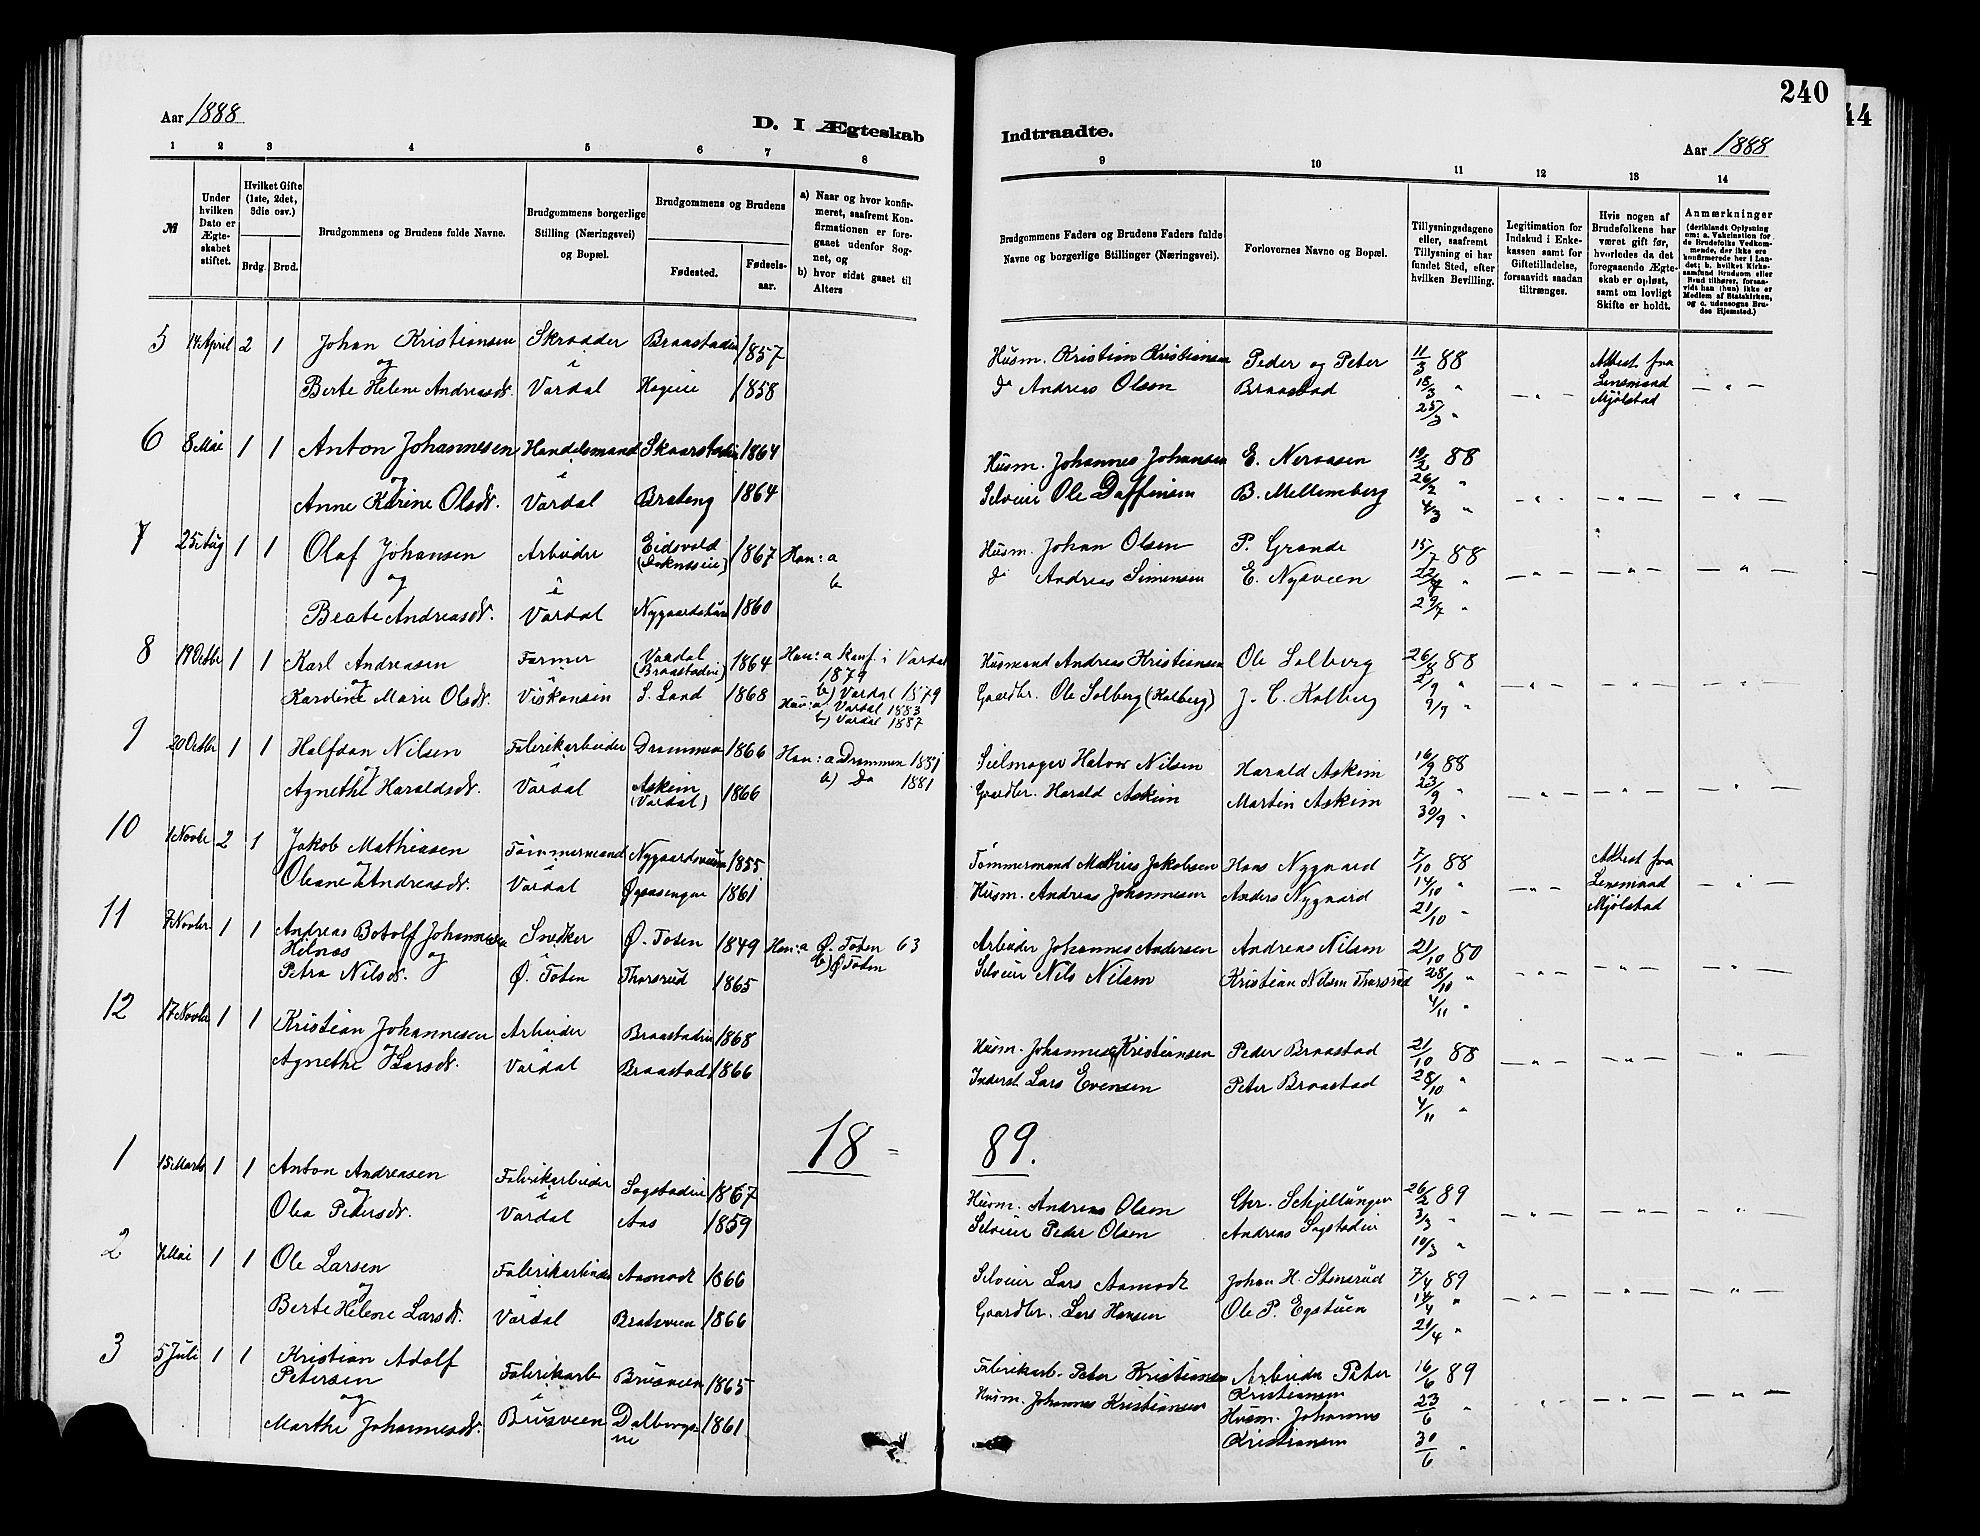 SAH, Vardal prestekontor, H/Ha/Hab/L0007: Klokkerbok nr. 7 /1, 1881-1895, s. 240